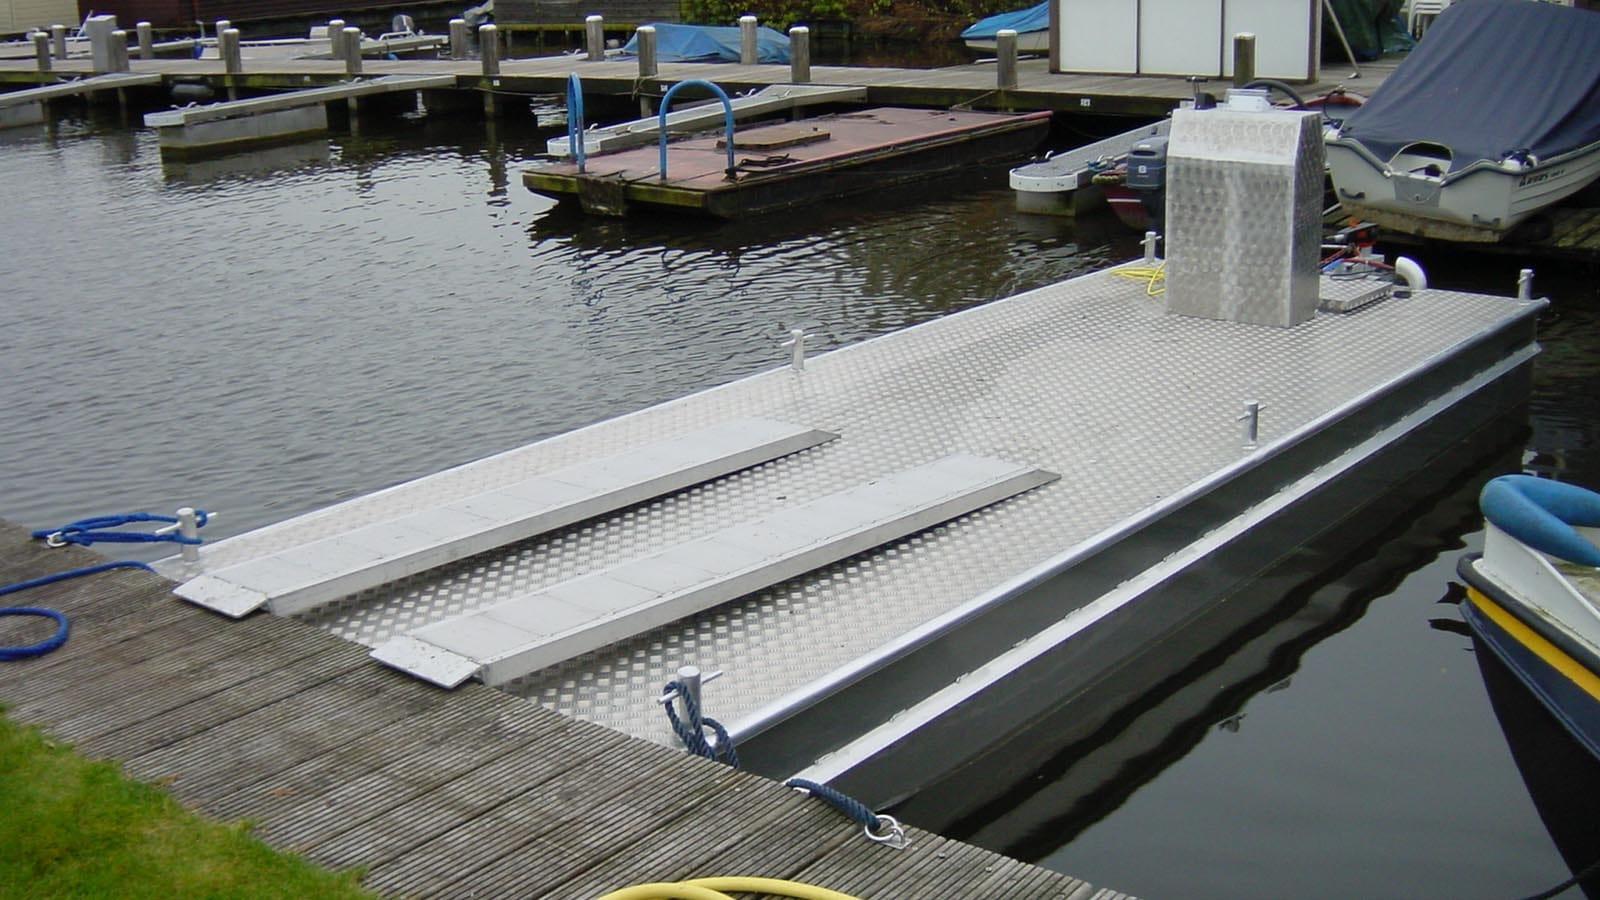 AluminiumJon.nl-Ponton 6 meter-Standard & Heavy Duty-Custom build aluminum work pontoons